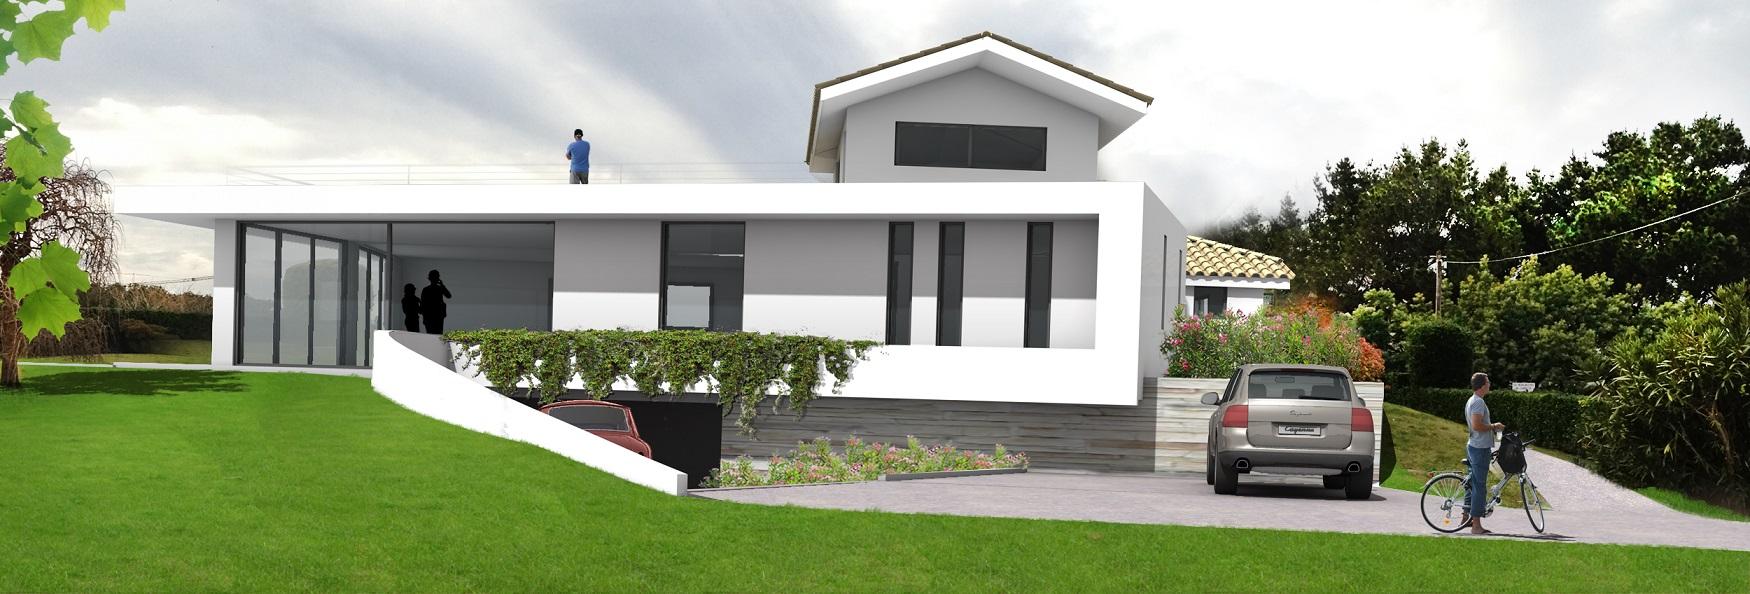 Maison à Chiberta-ANGLET